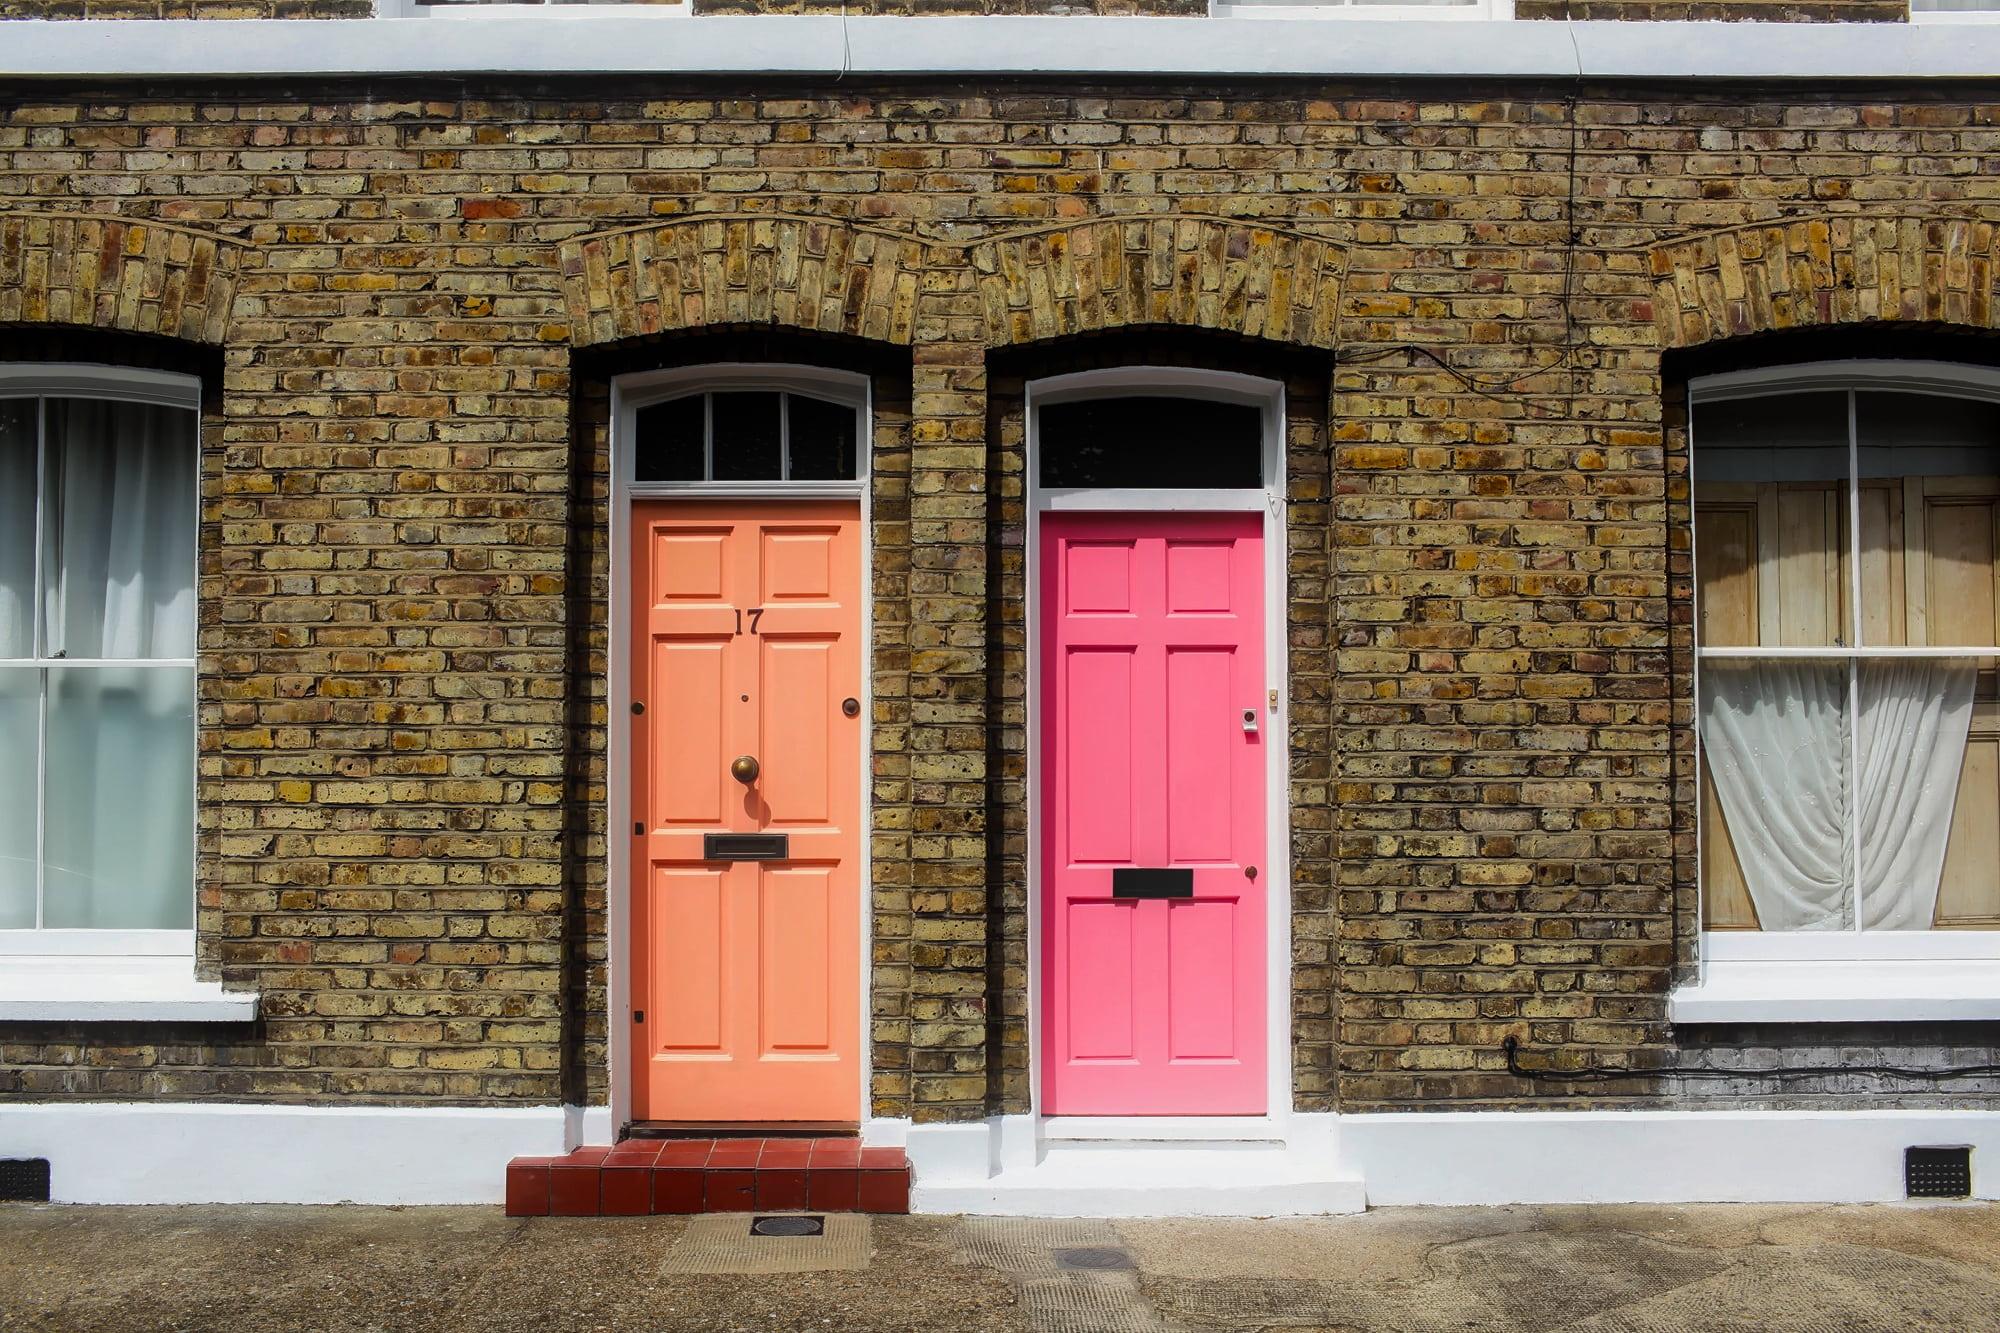 doorstep loans v high street loans